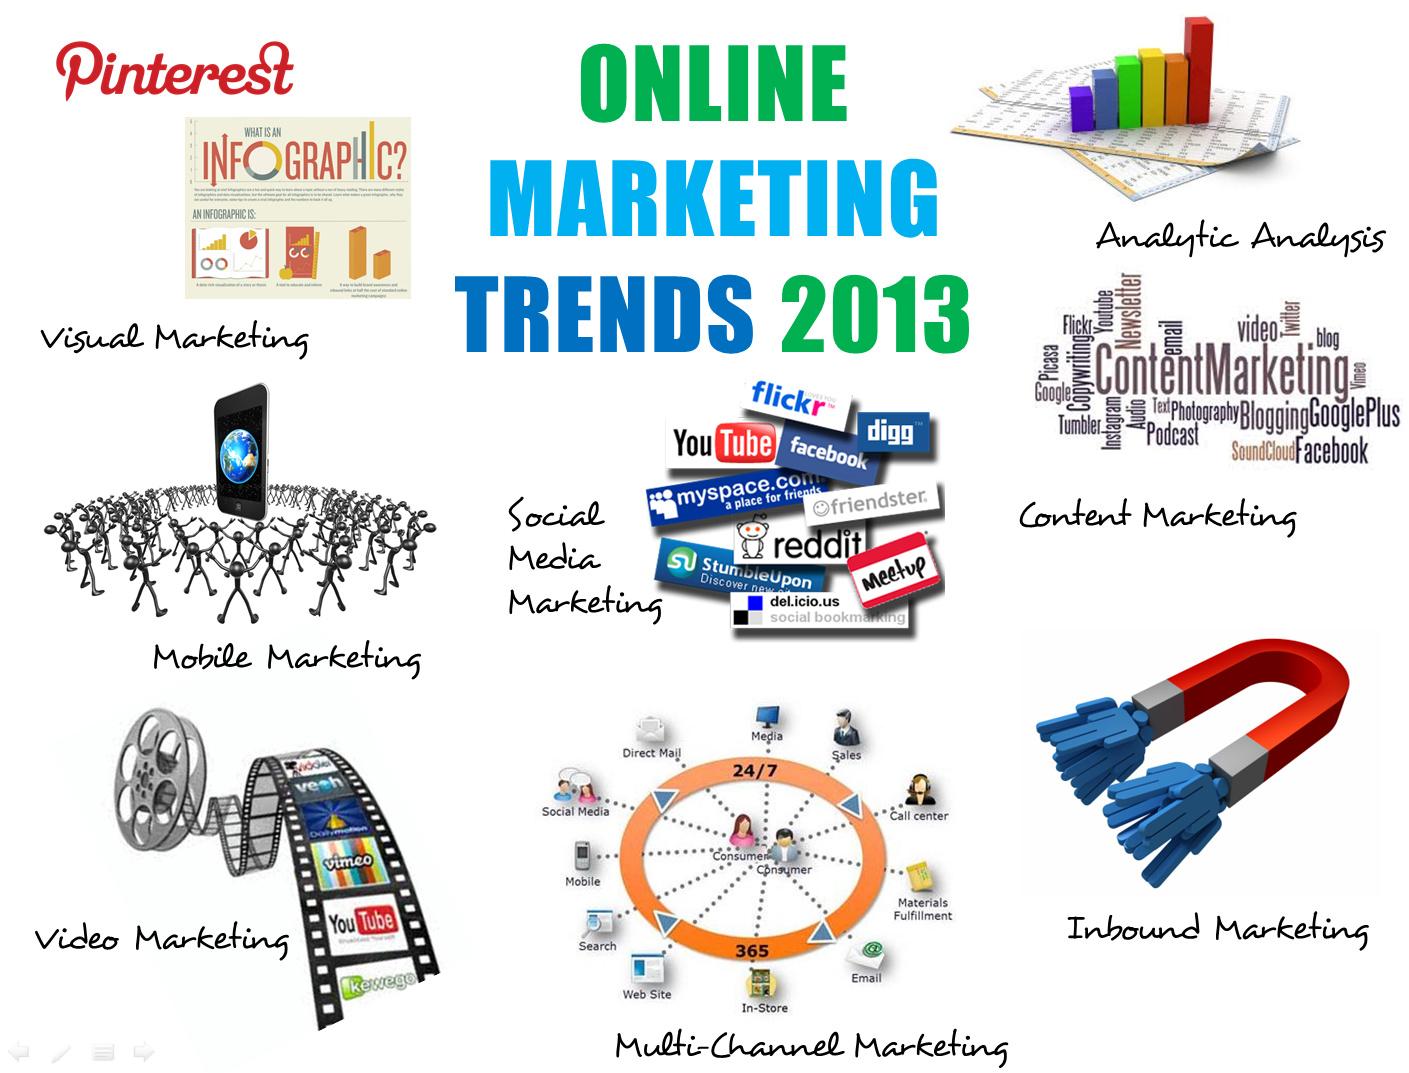 2013 Marketing Trends